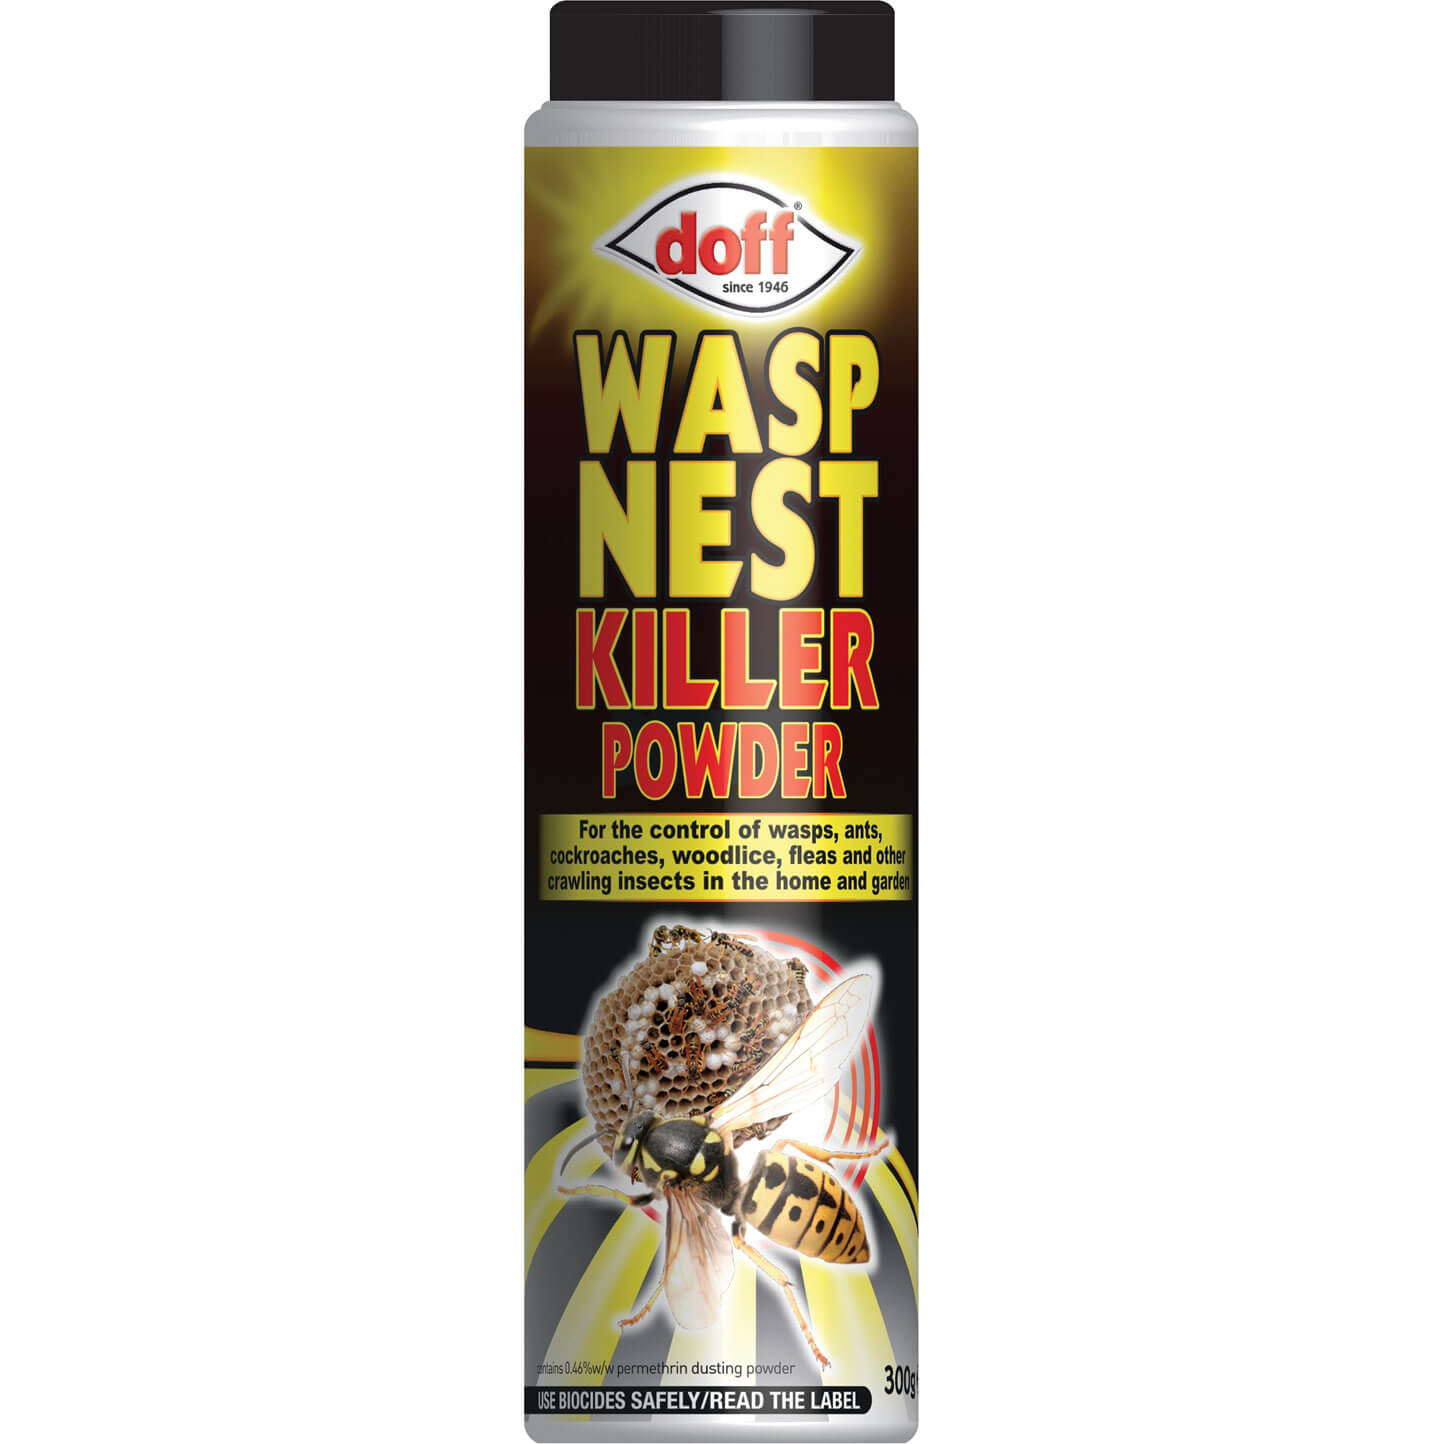 Image of Doff Wasp Nest Killer Powder 300g